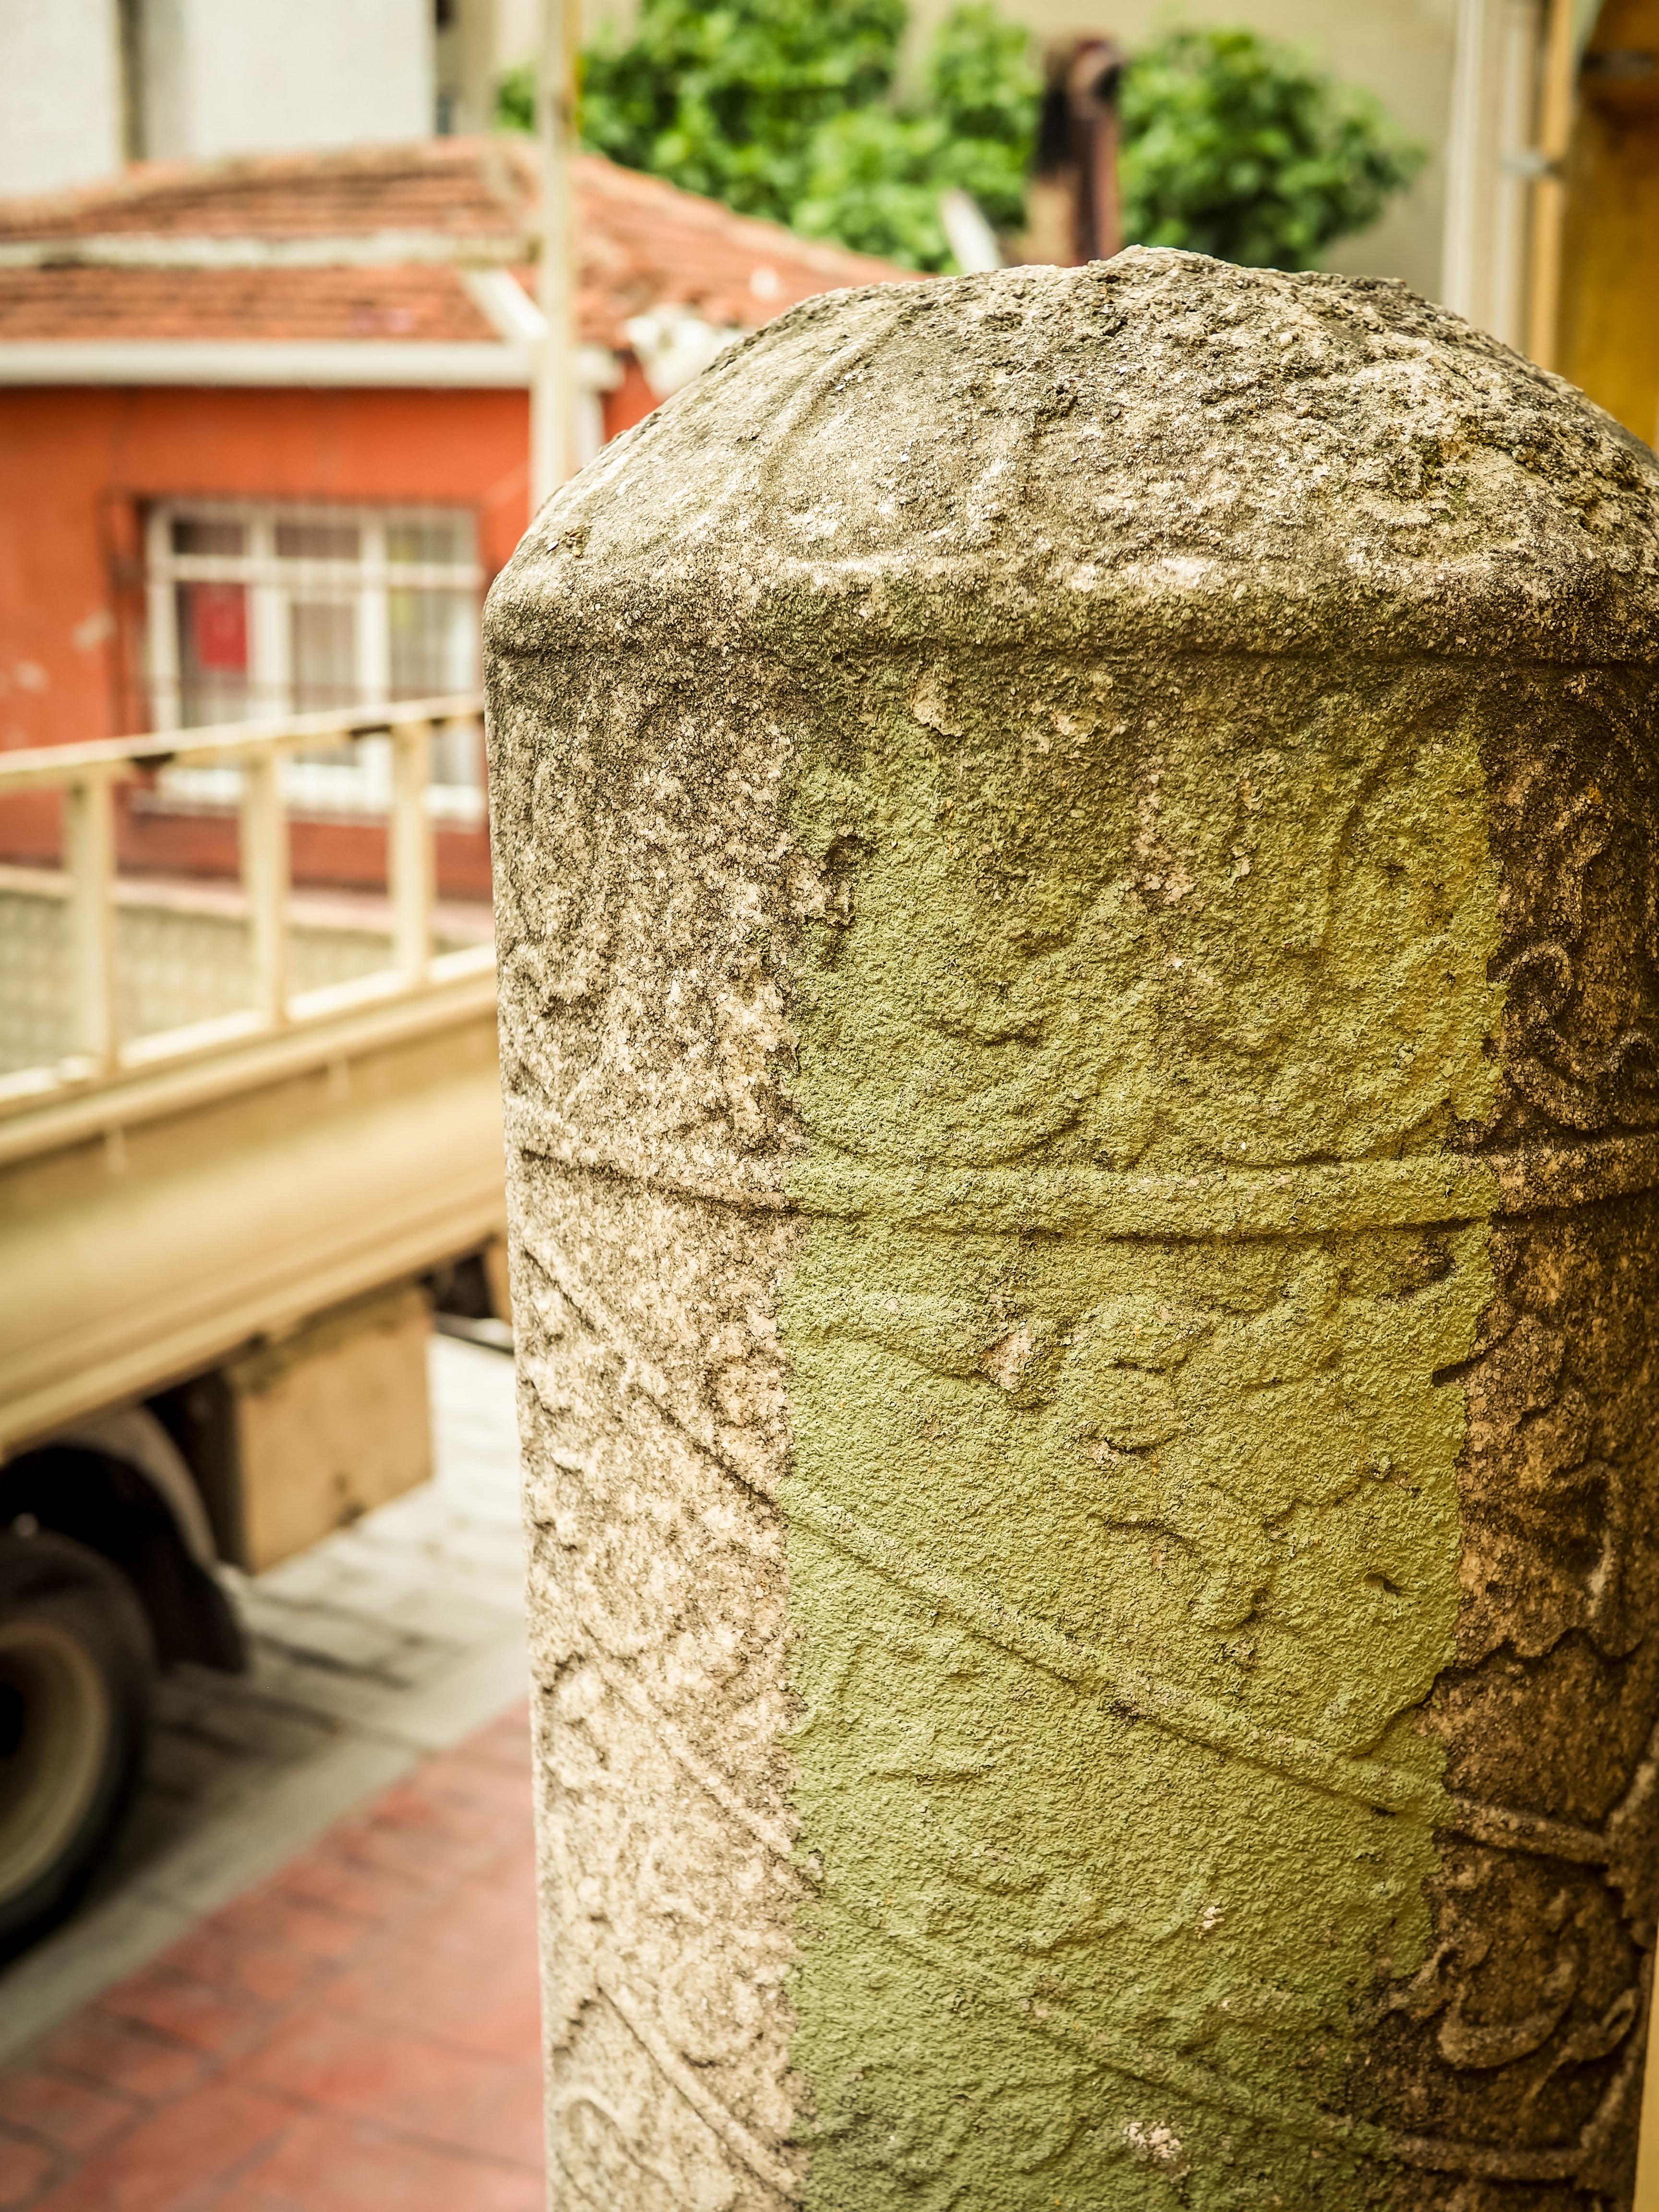 Target stone, Okmeydani, Istanbul